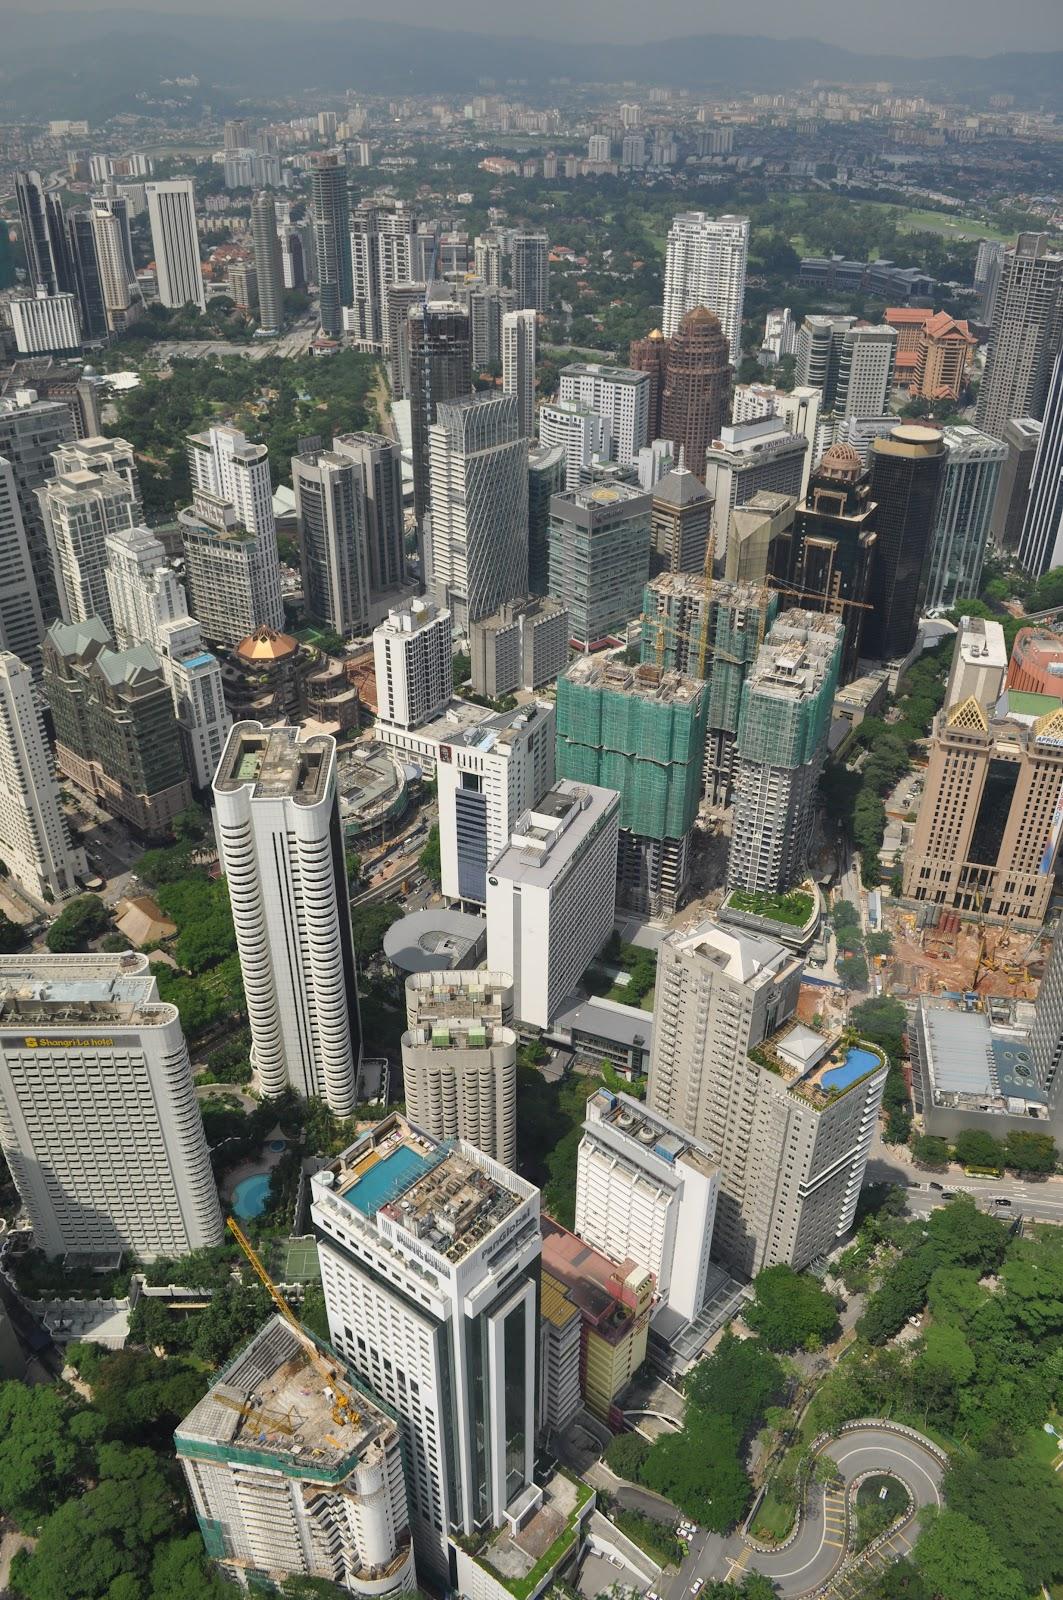 kuala-lumpur-downtown-view-from-kl-tower-malaysia